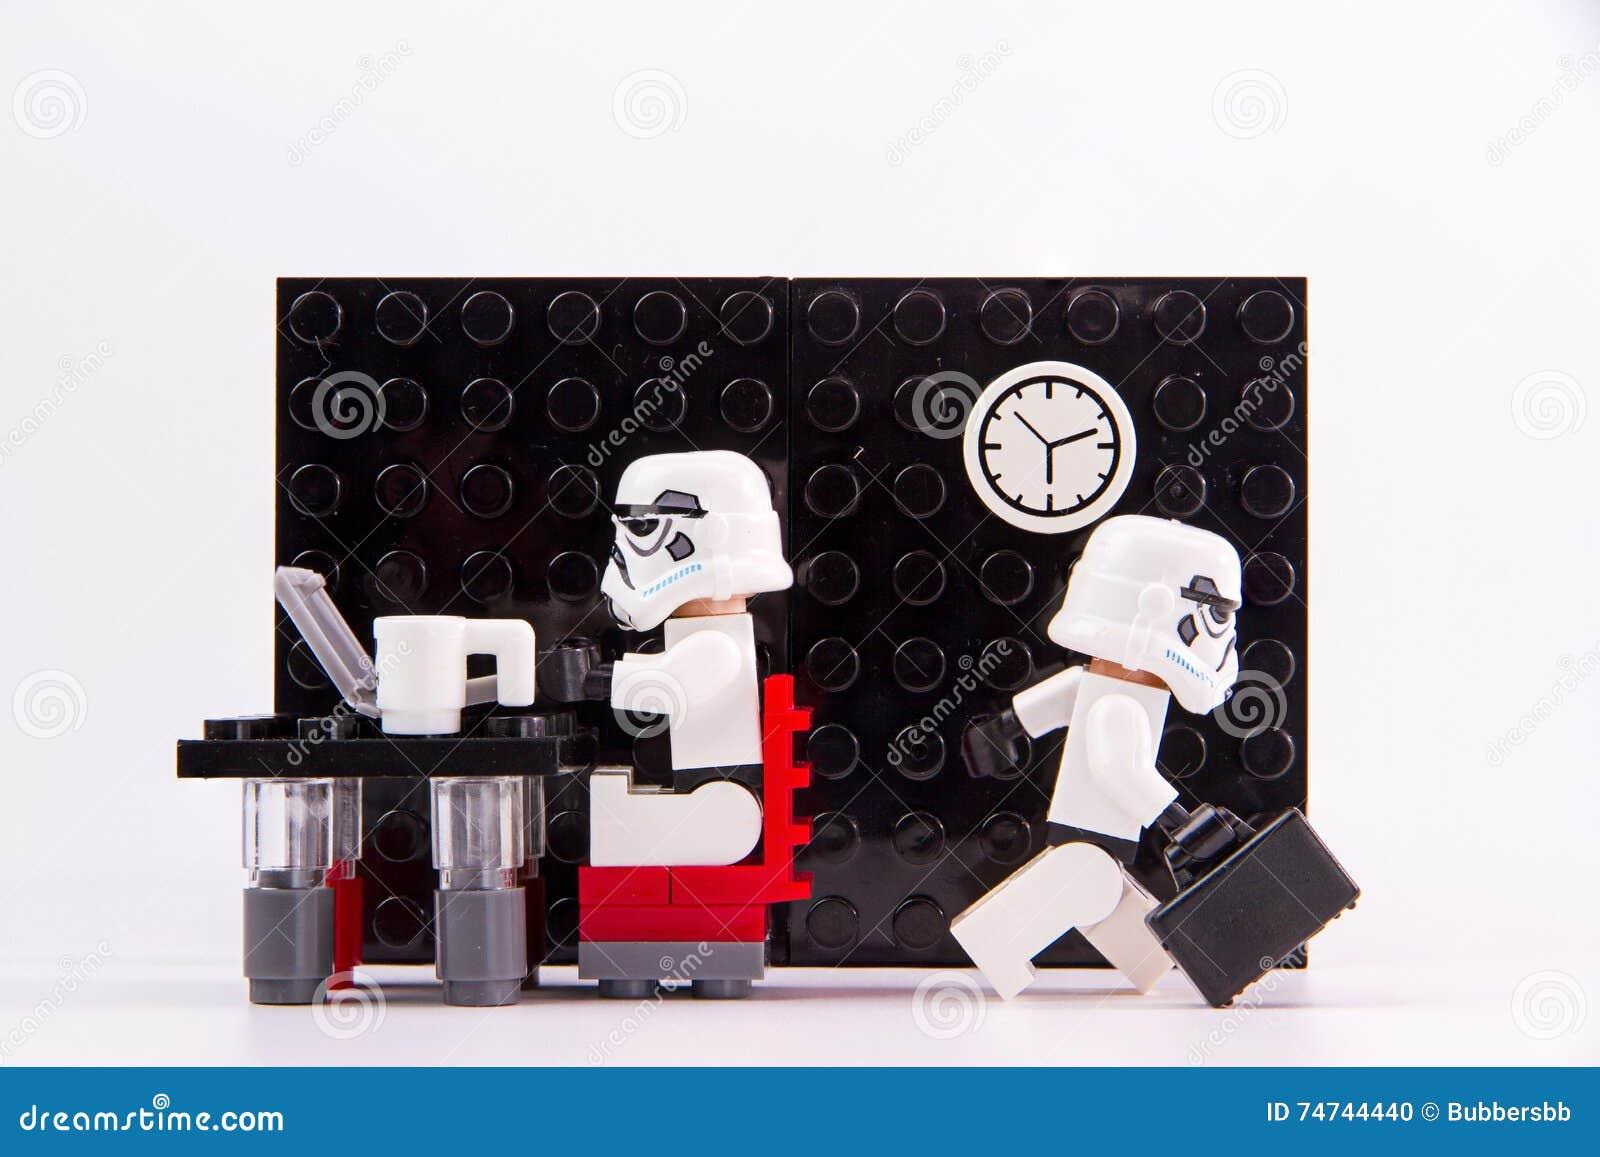 Lego Time Stock Photos